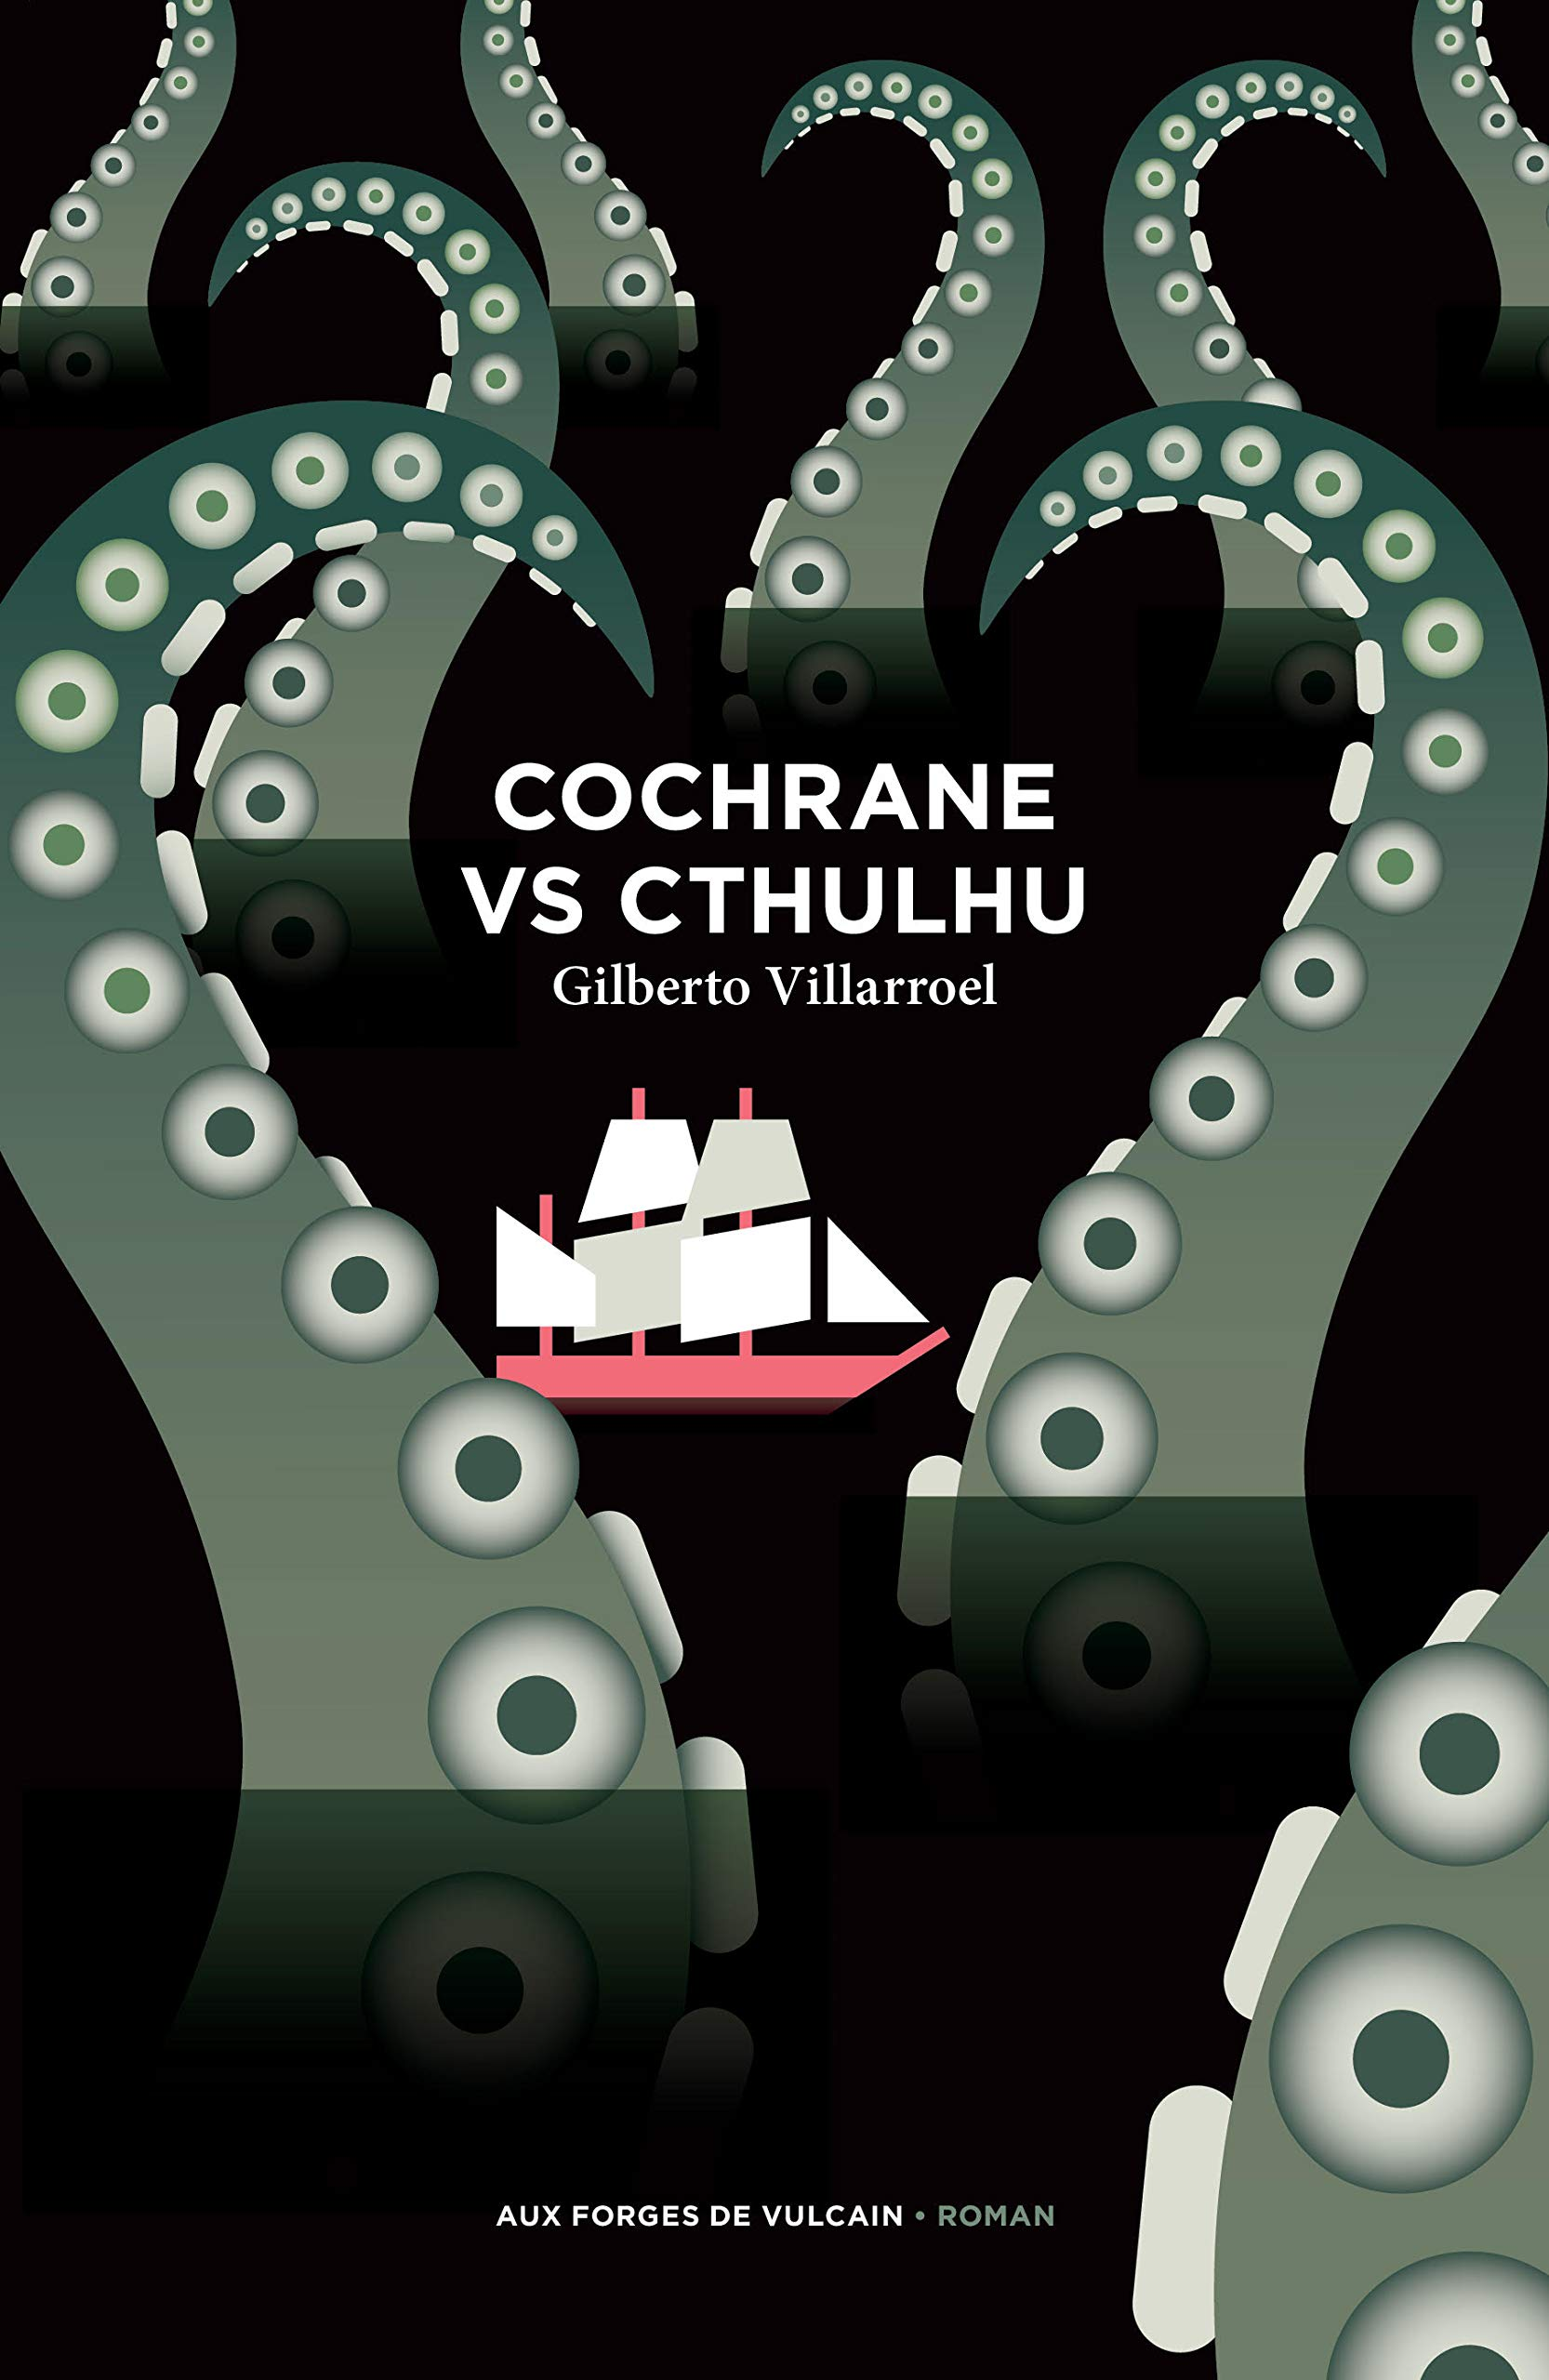 Cochrane VS Cthulhu de Gilberto Villaroel